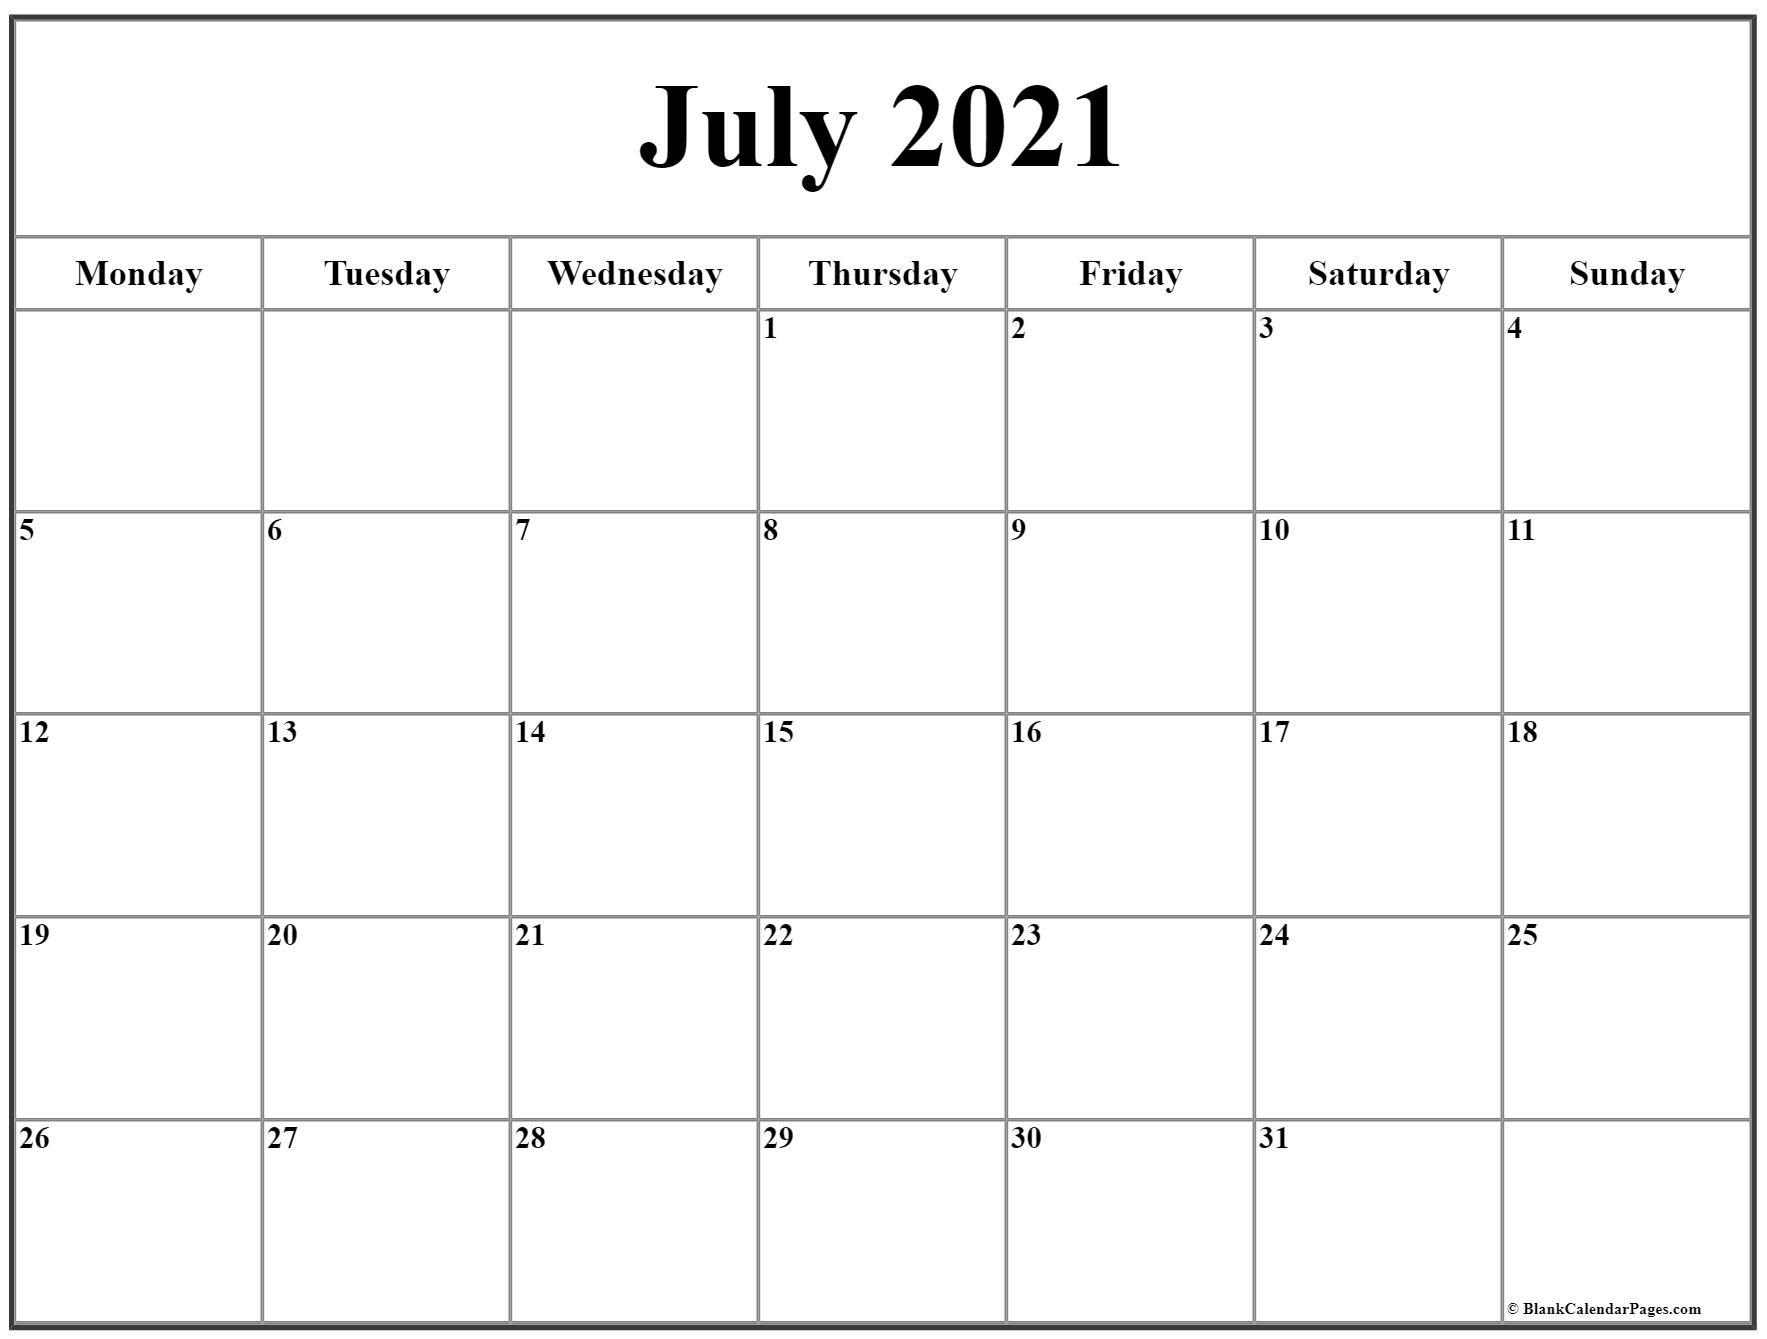 July 2021 Monday Calendar | Monday To Sunday-Printable Monday - Friday July 2021